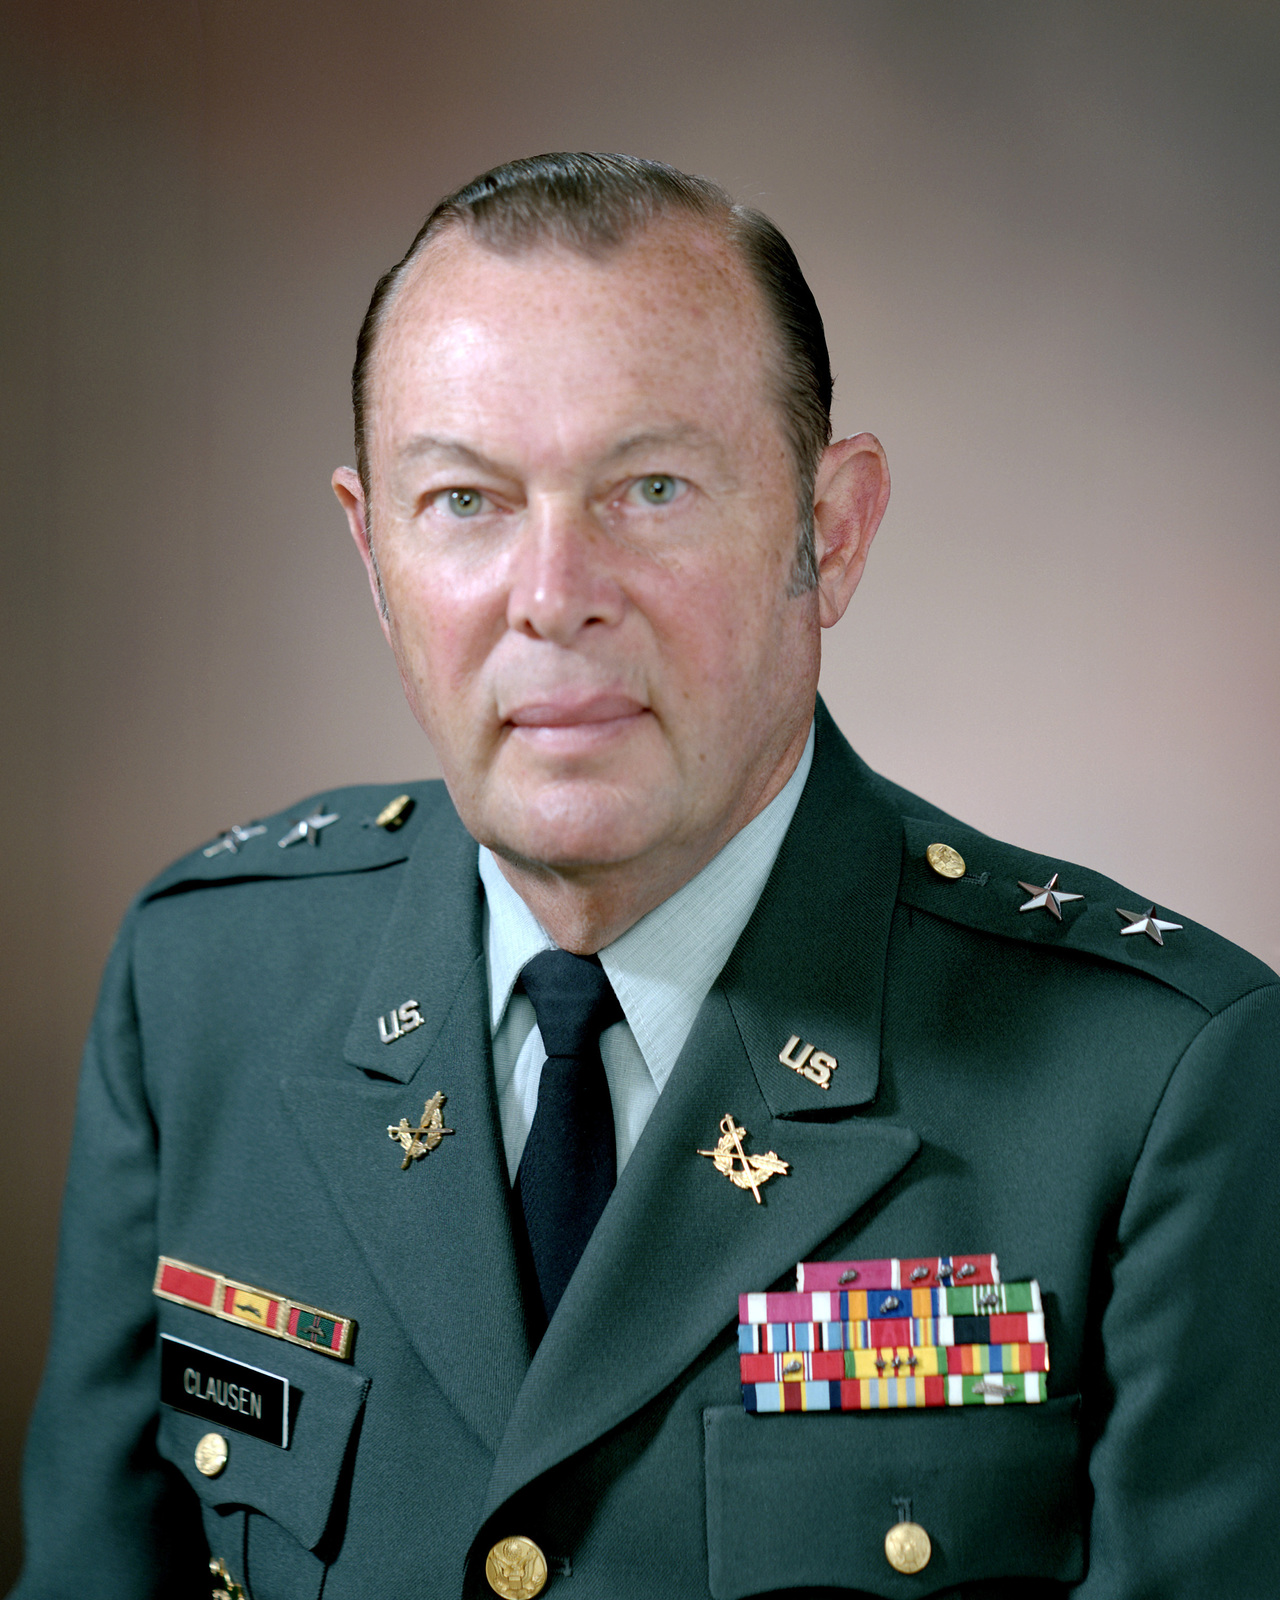 Portrait:  US Army (USA) Major General (MGEN) Hugh J. Clausen (uncovered)